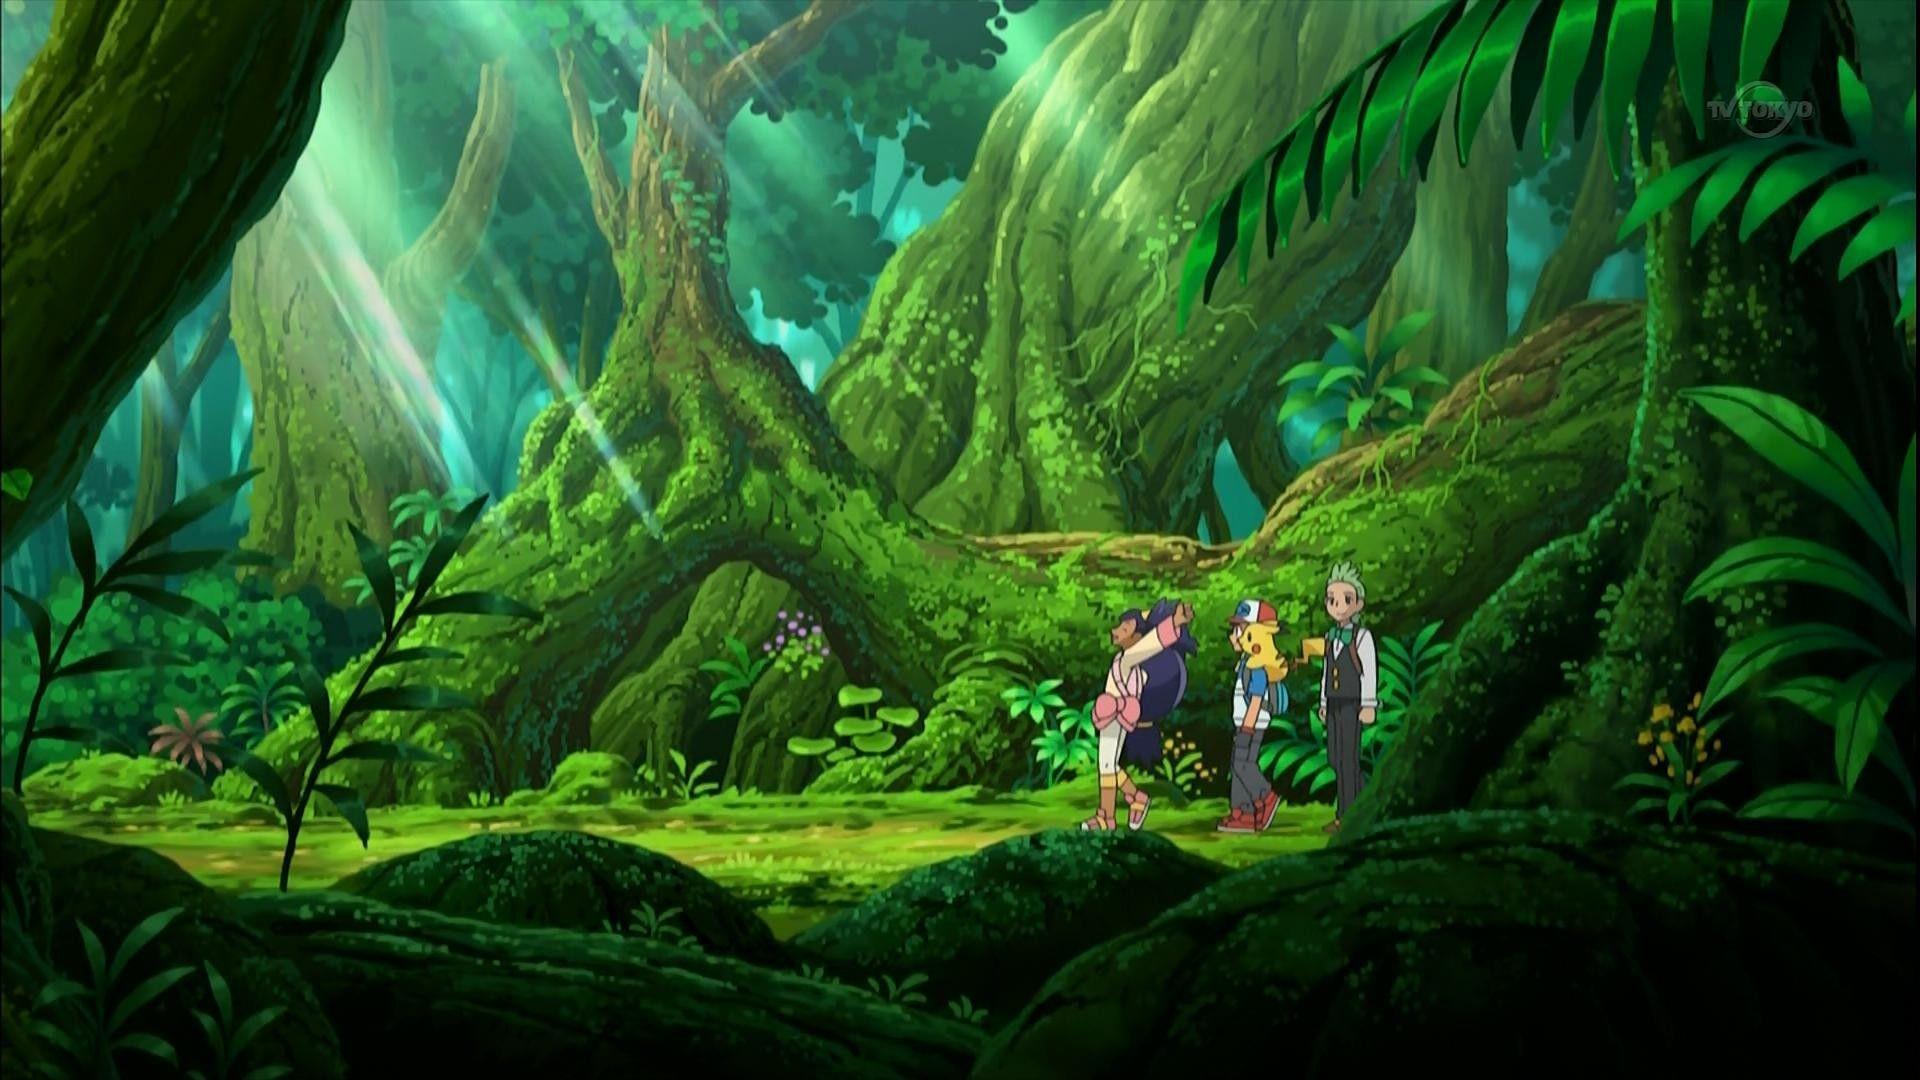 Pokémon Anime Forest Backgrounds - Wallpaper Cave